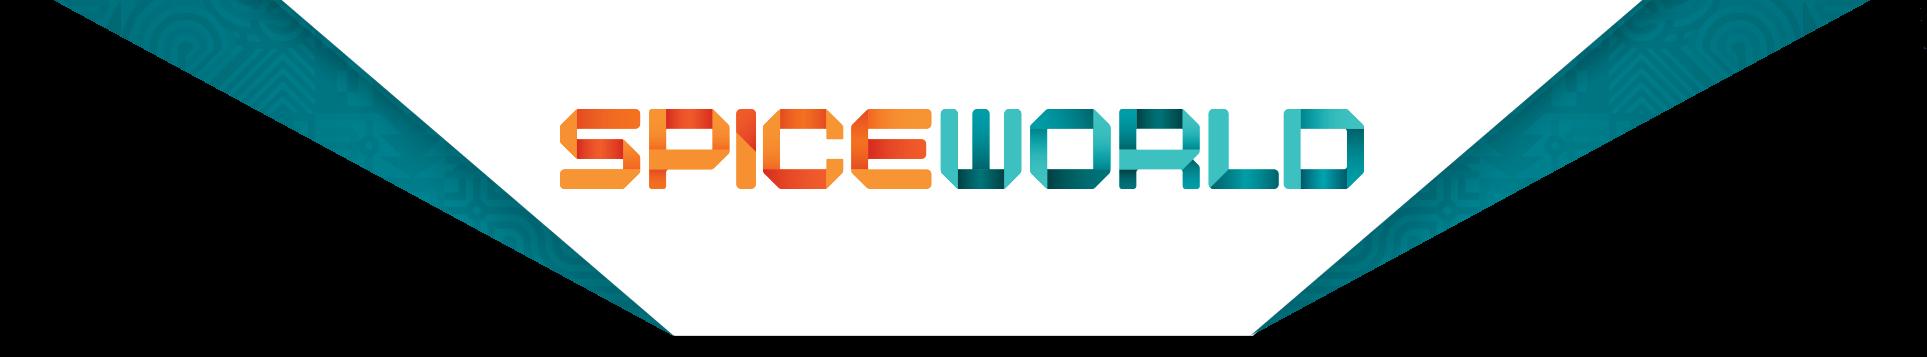 SpiceWorld Austin 2018